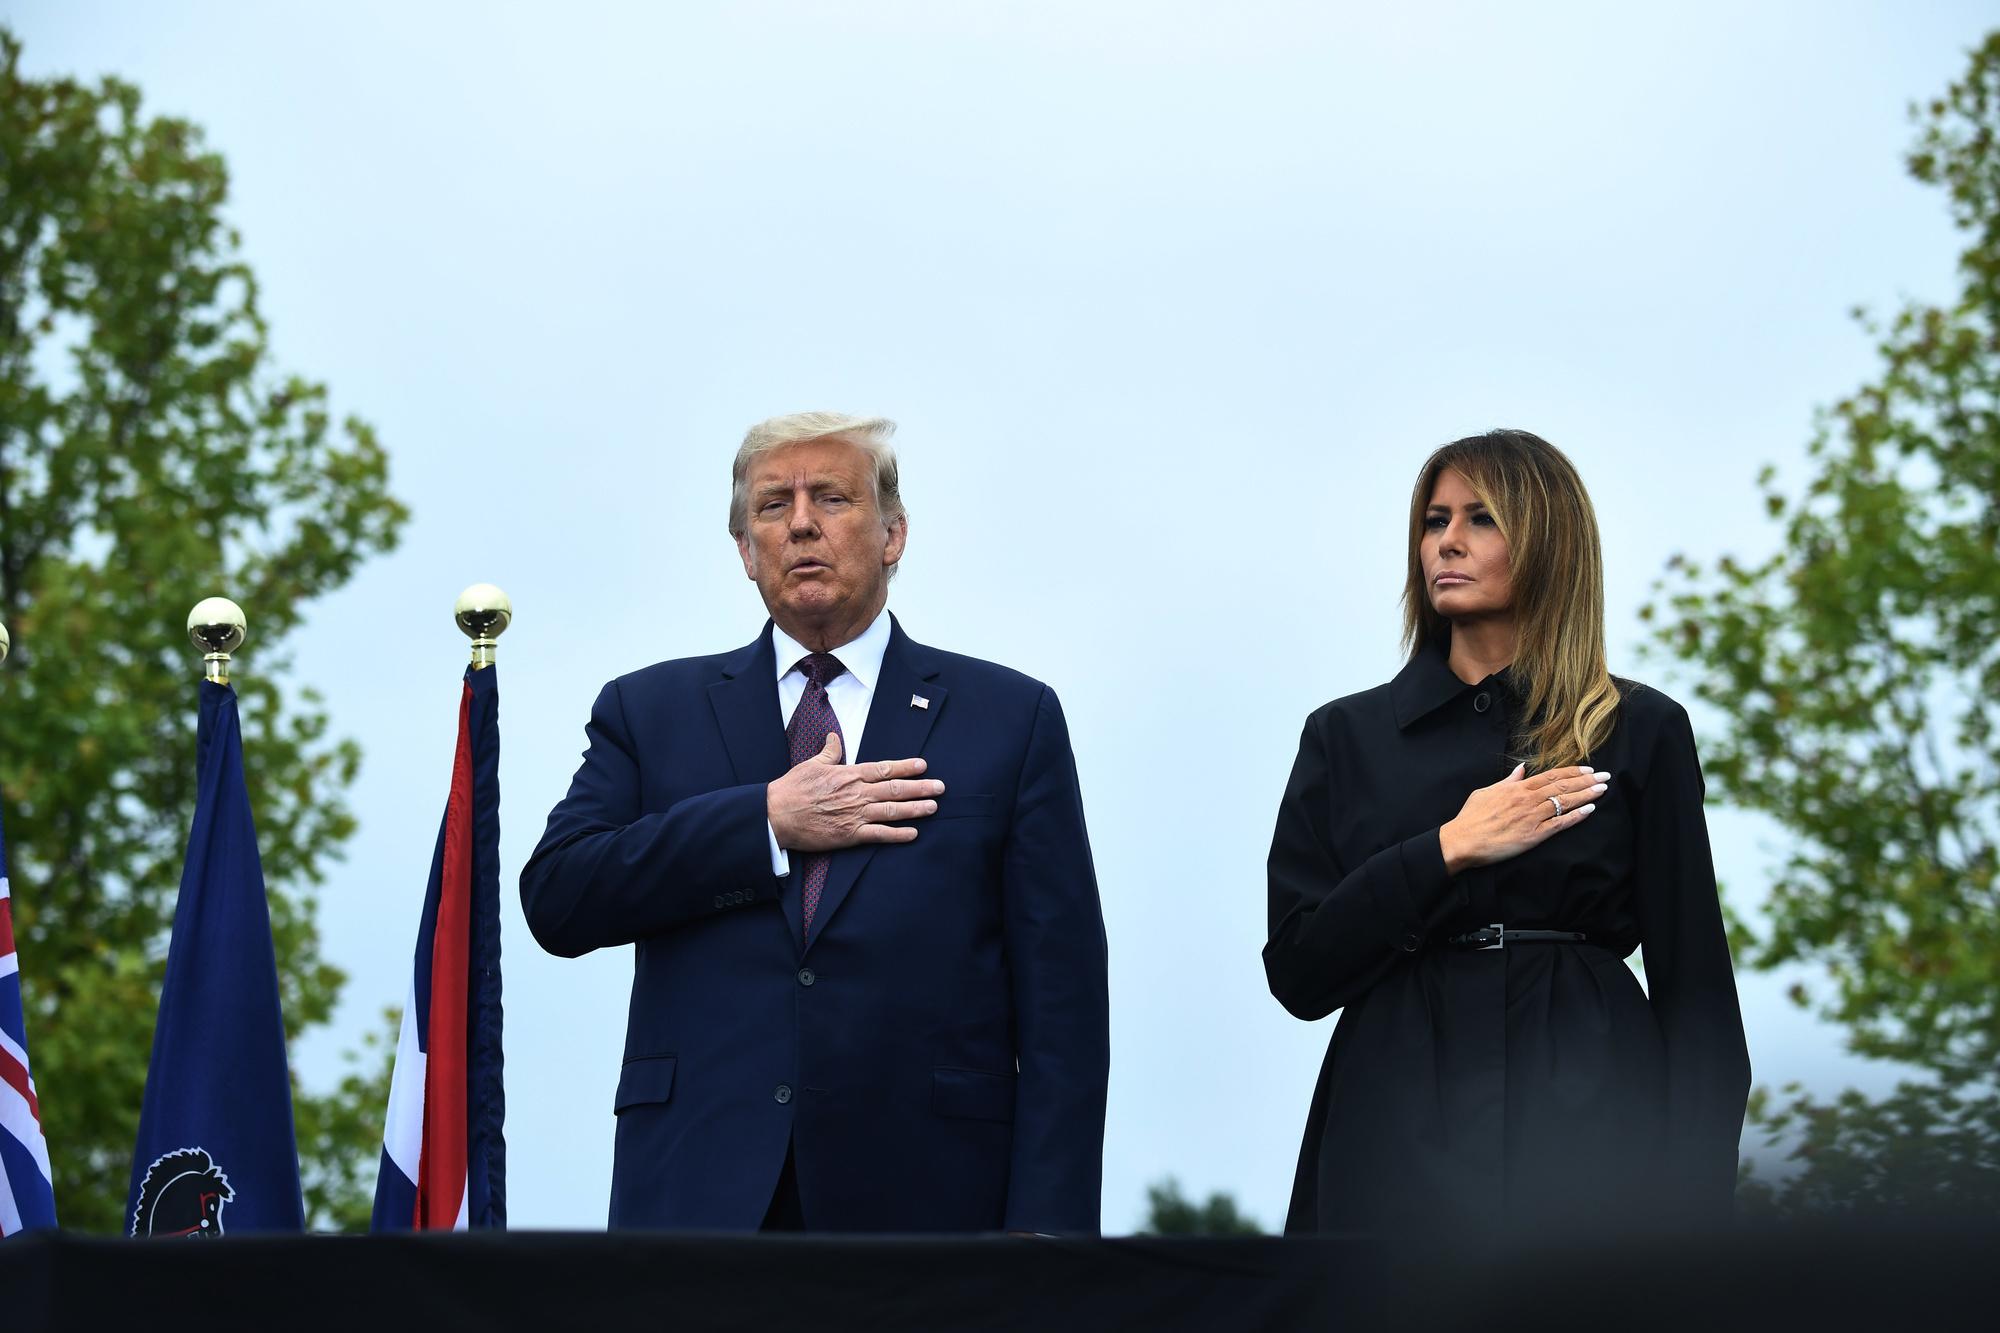 Donald et Melania Trump à Shanksville, Pennsylvanie, Brendan Smialowski / AFP